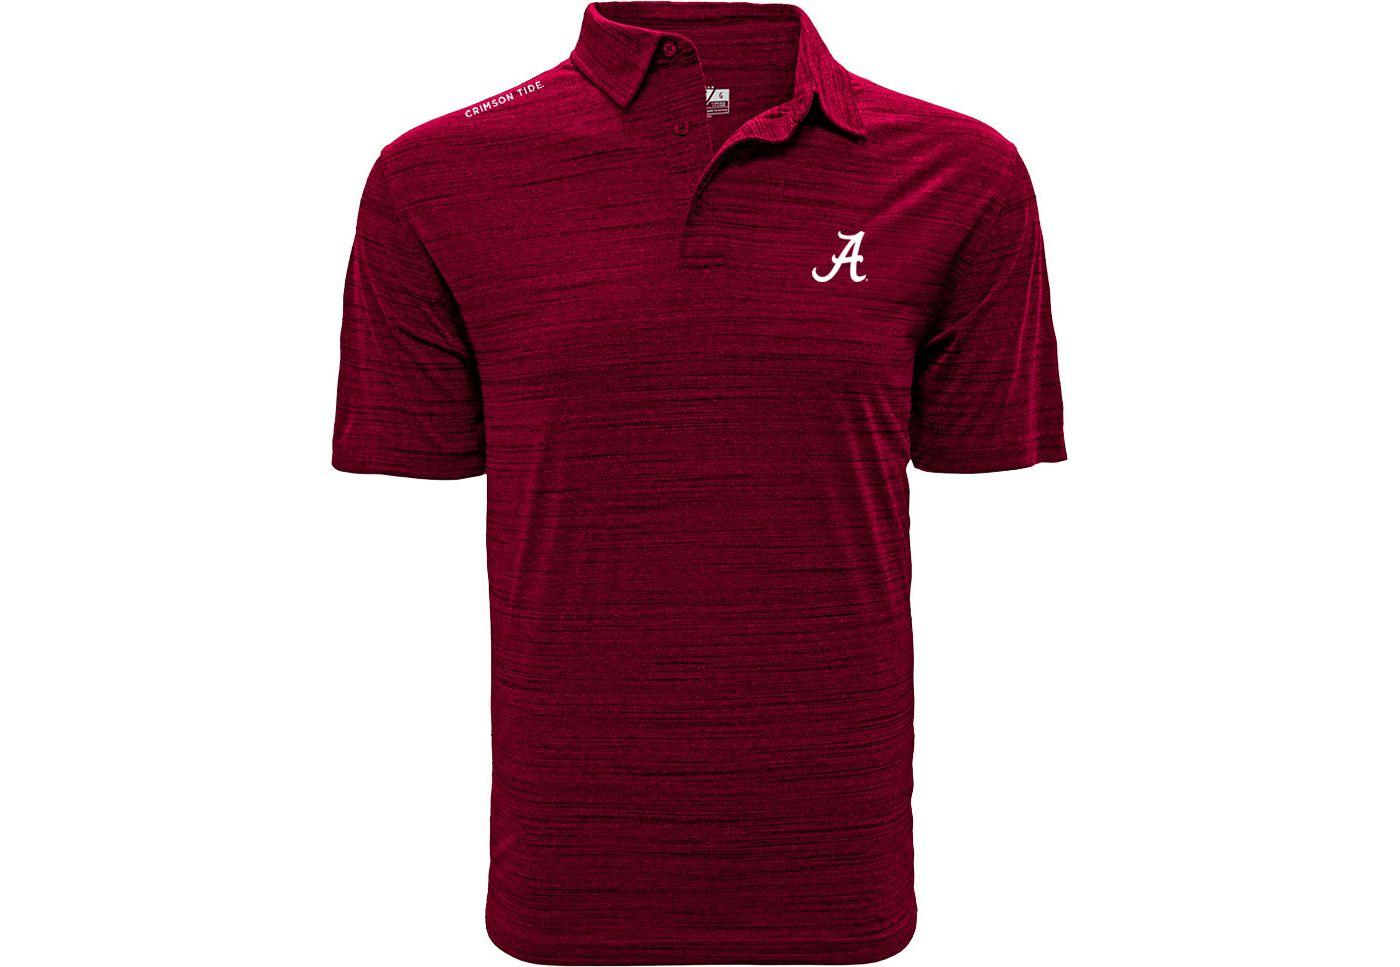 Levelwear Men's Alabama Crimson Tide Crimson Sway Polo